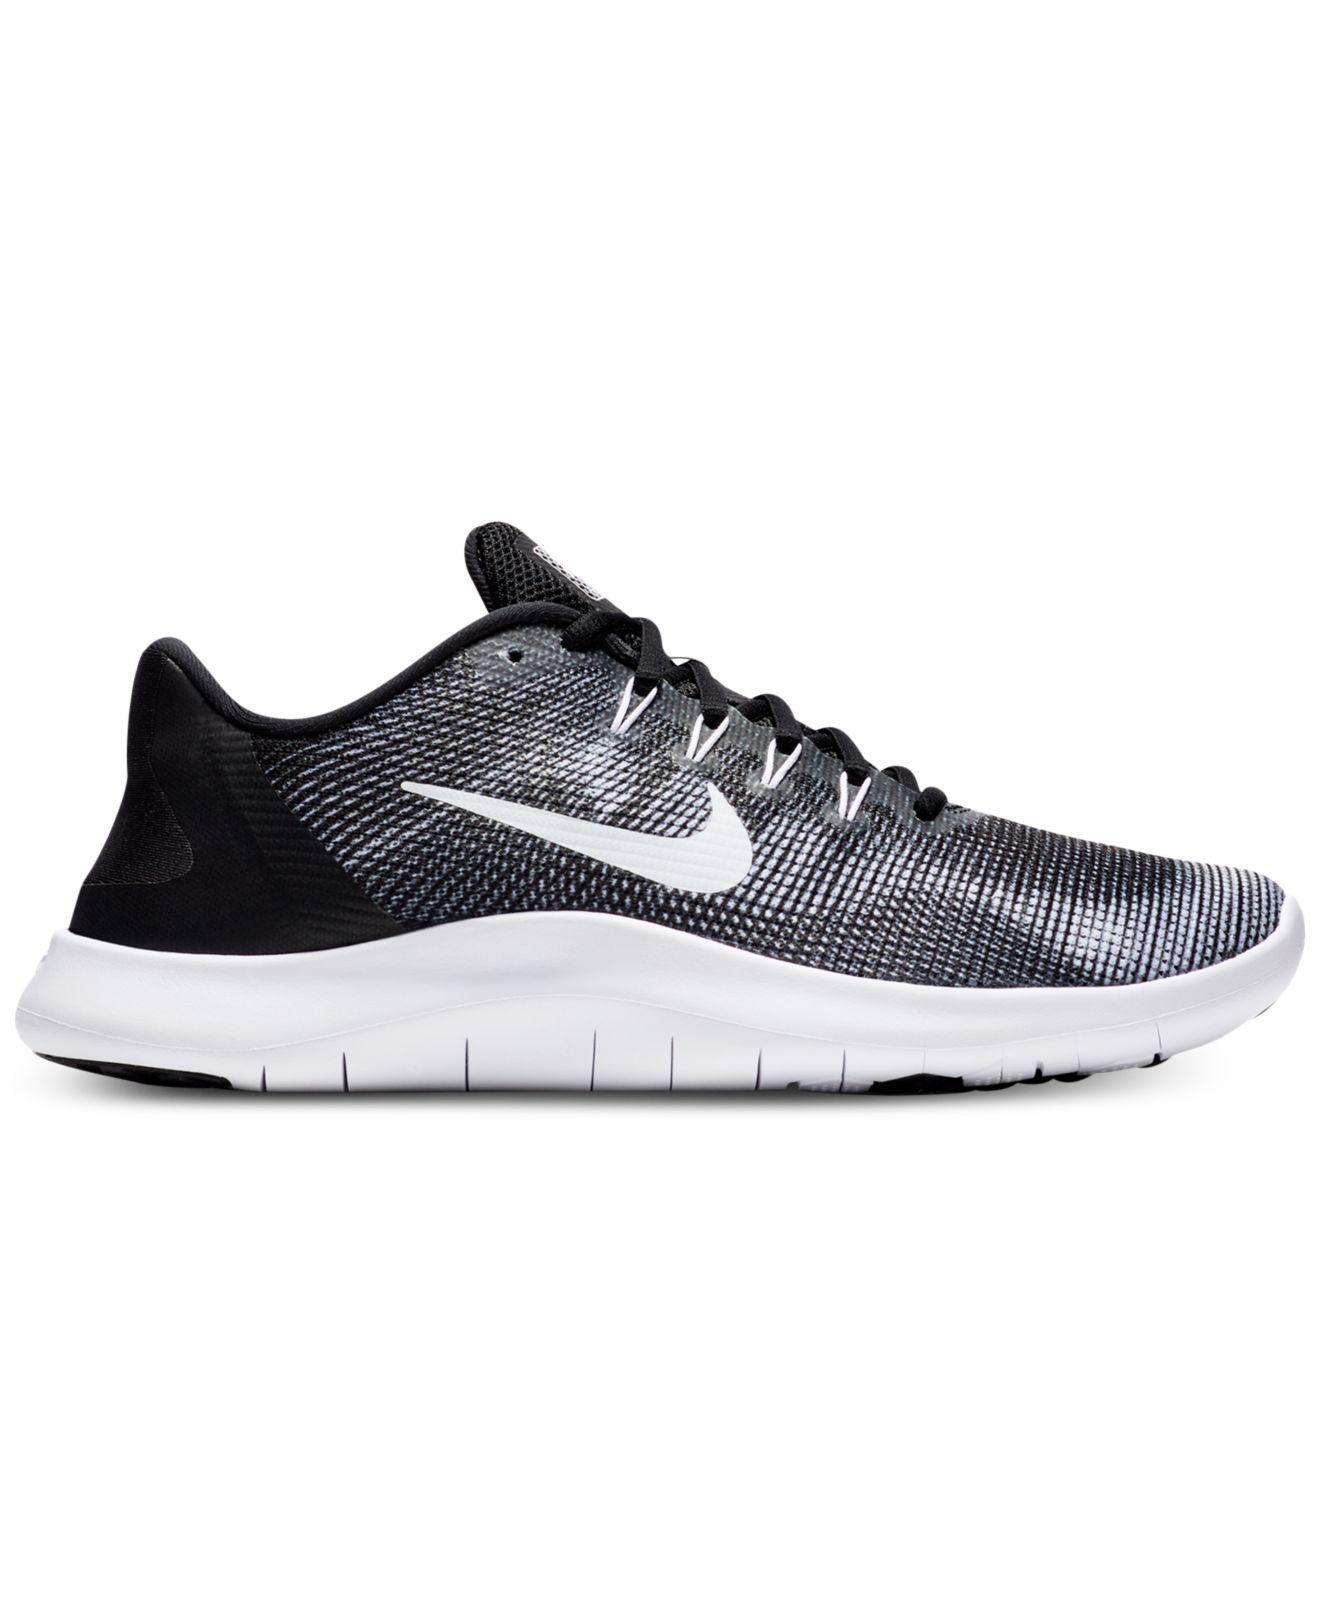 2d36bdff592 Lyst - Nike Flex Rn 2018 Mesh Sneaker in Black for Men - Save 43%